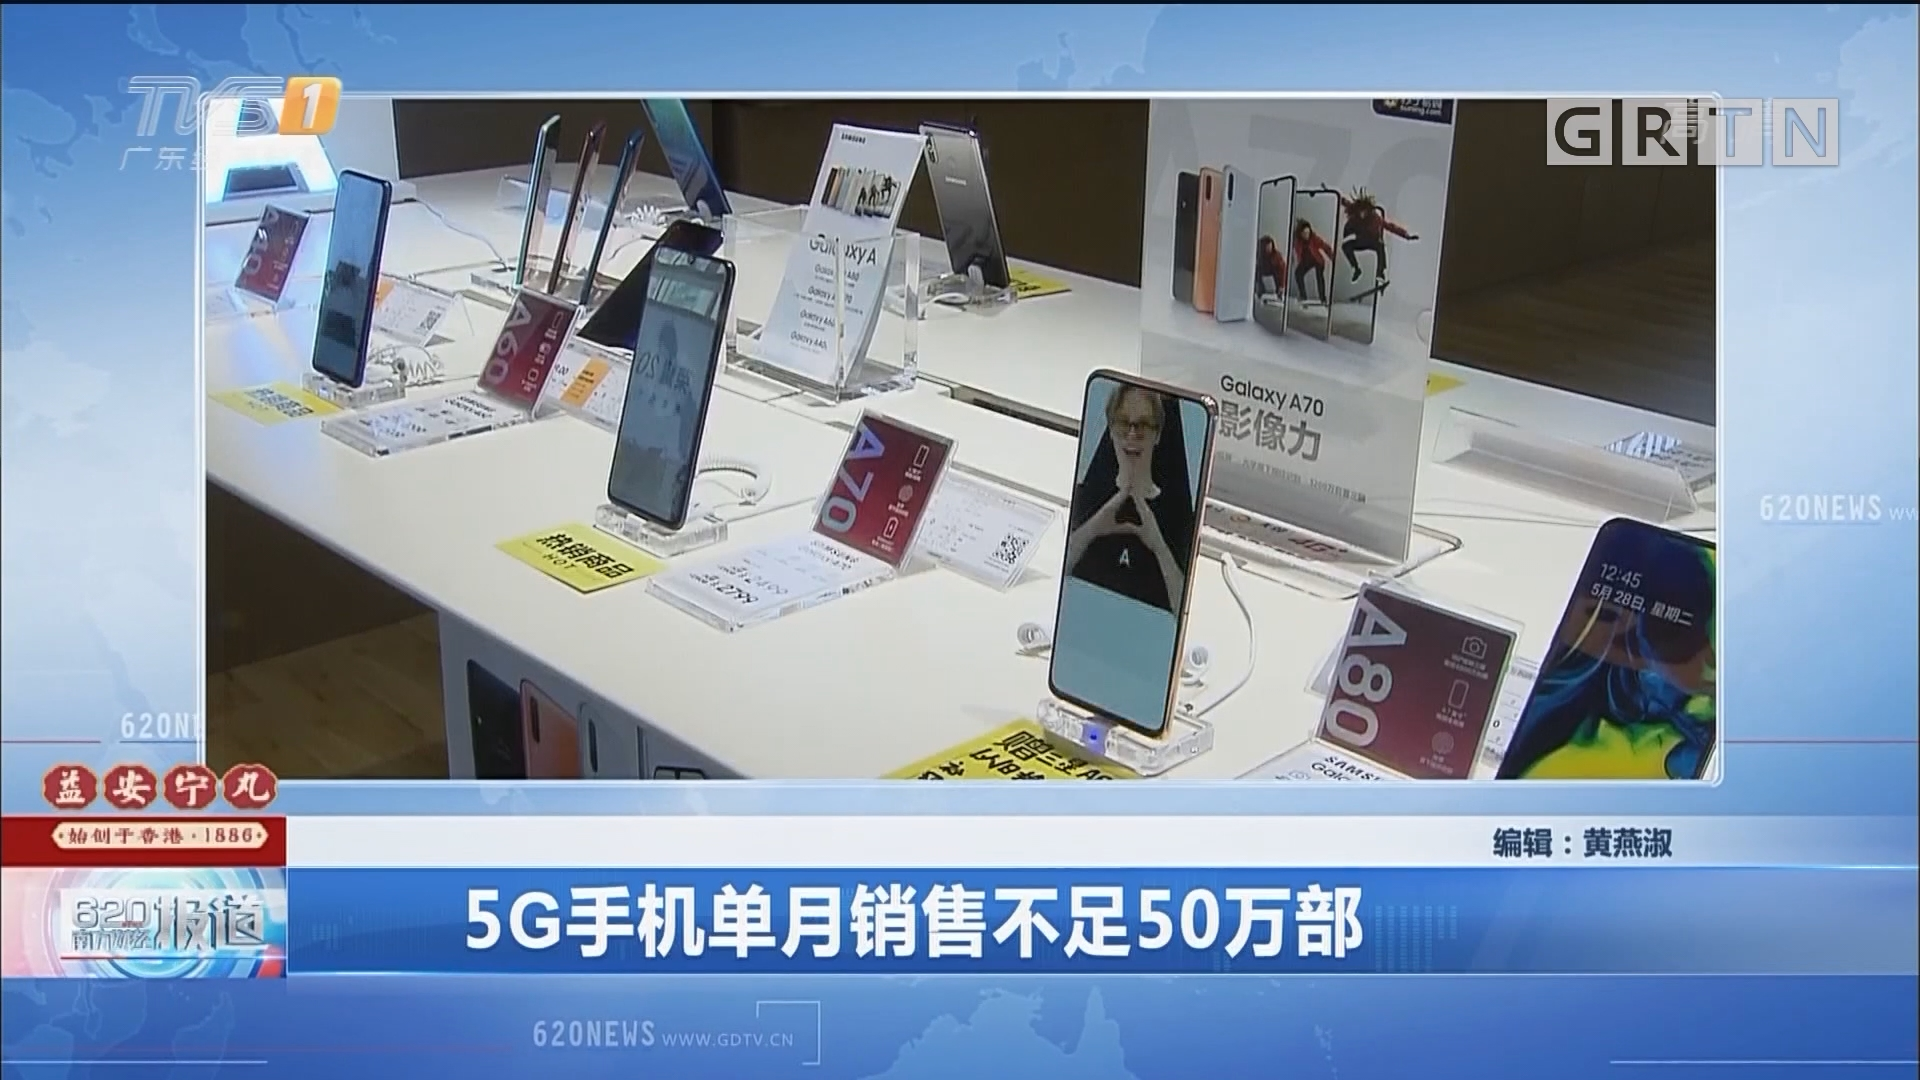 5G手机单月销售不足50万部